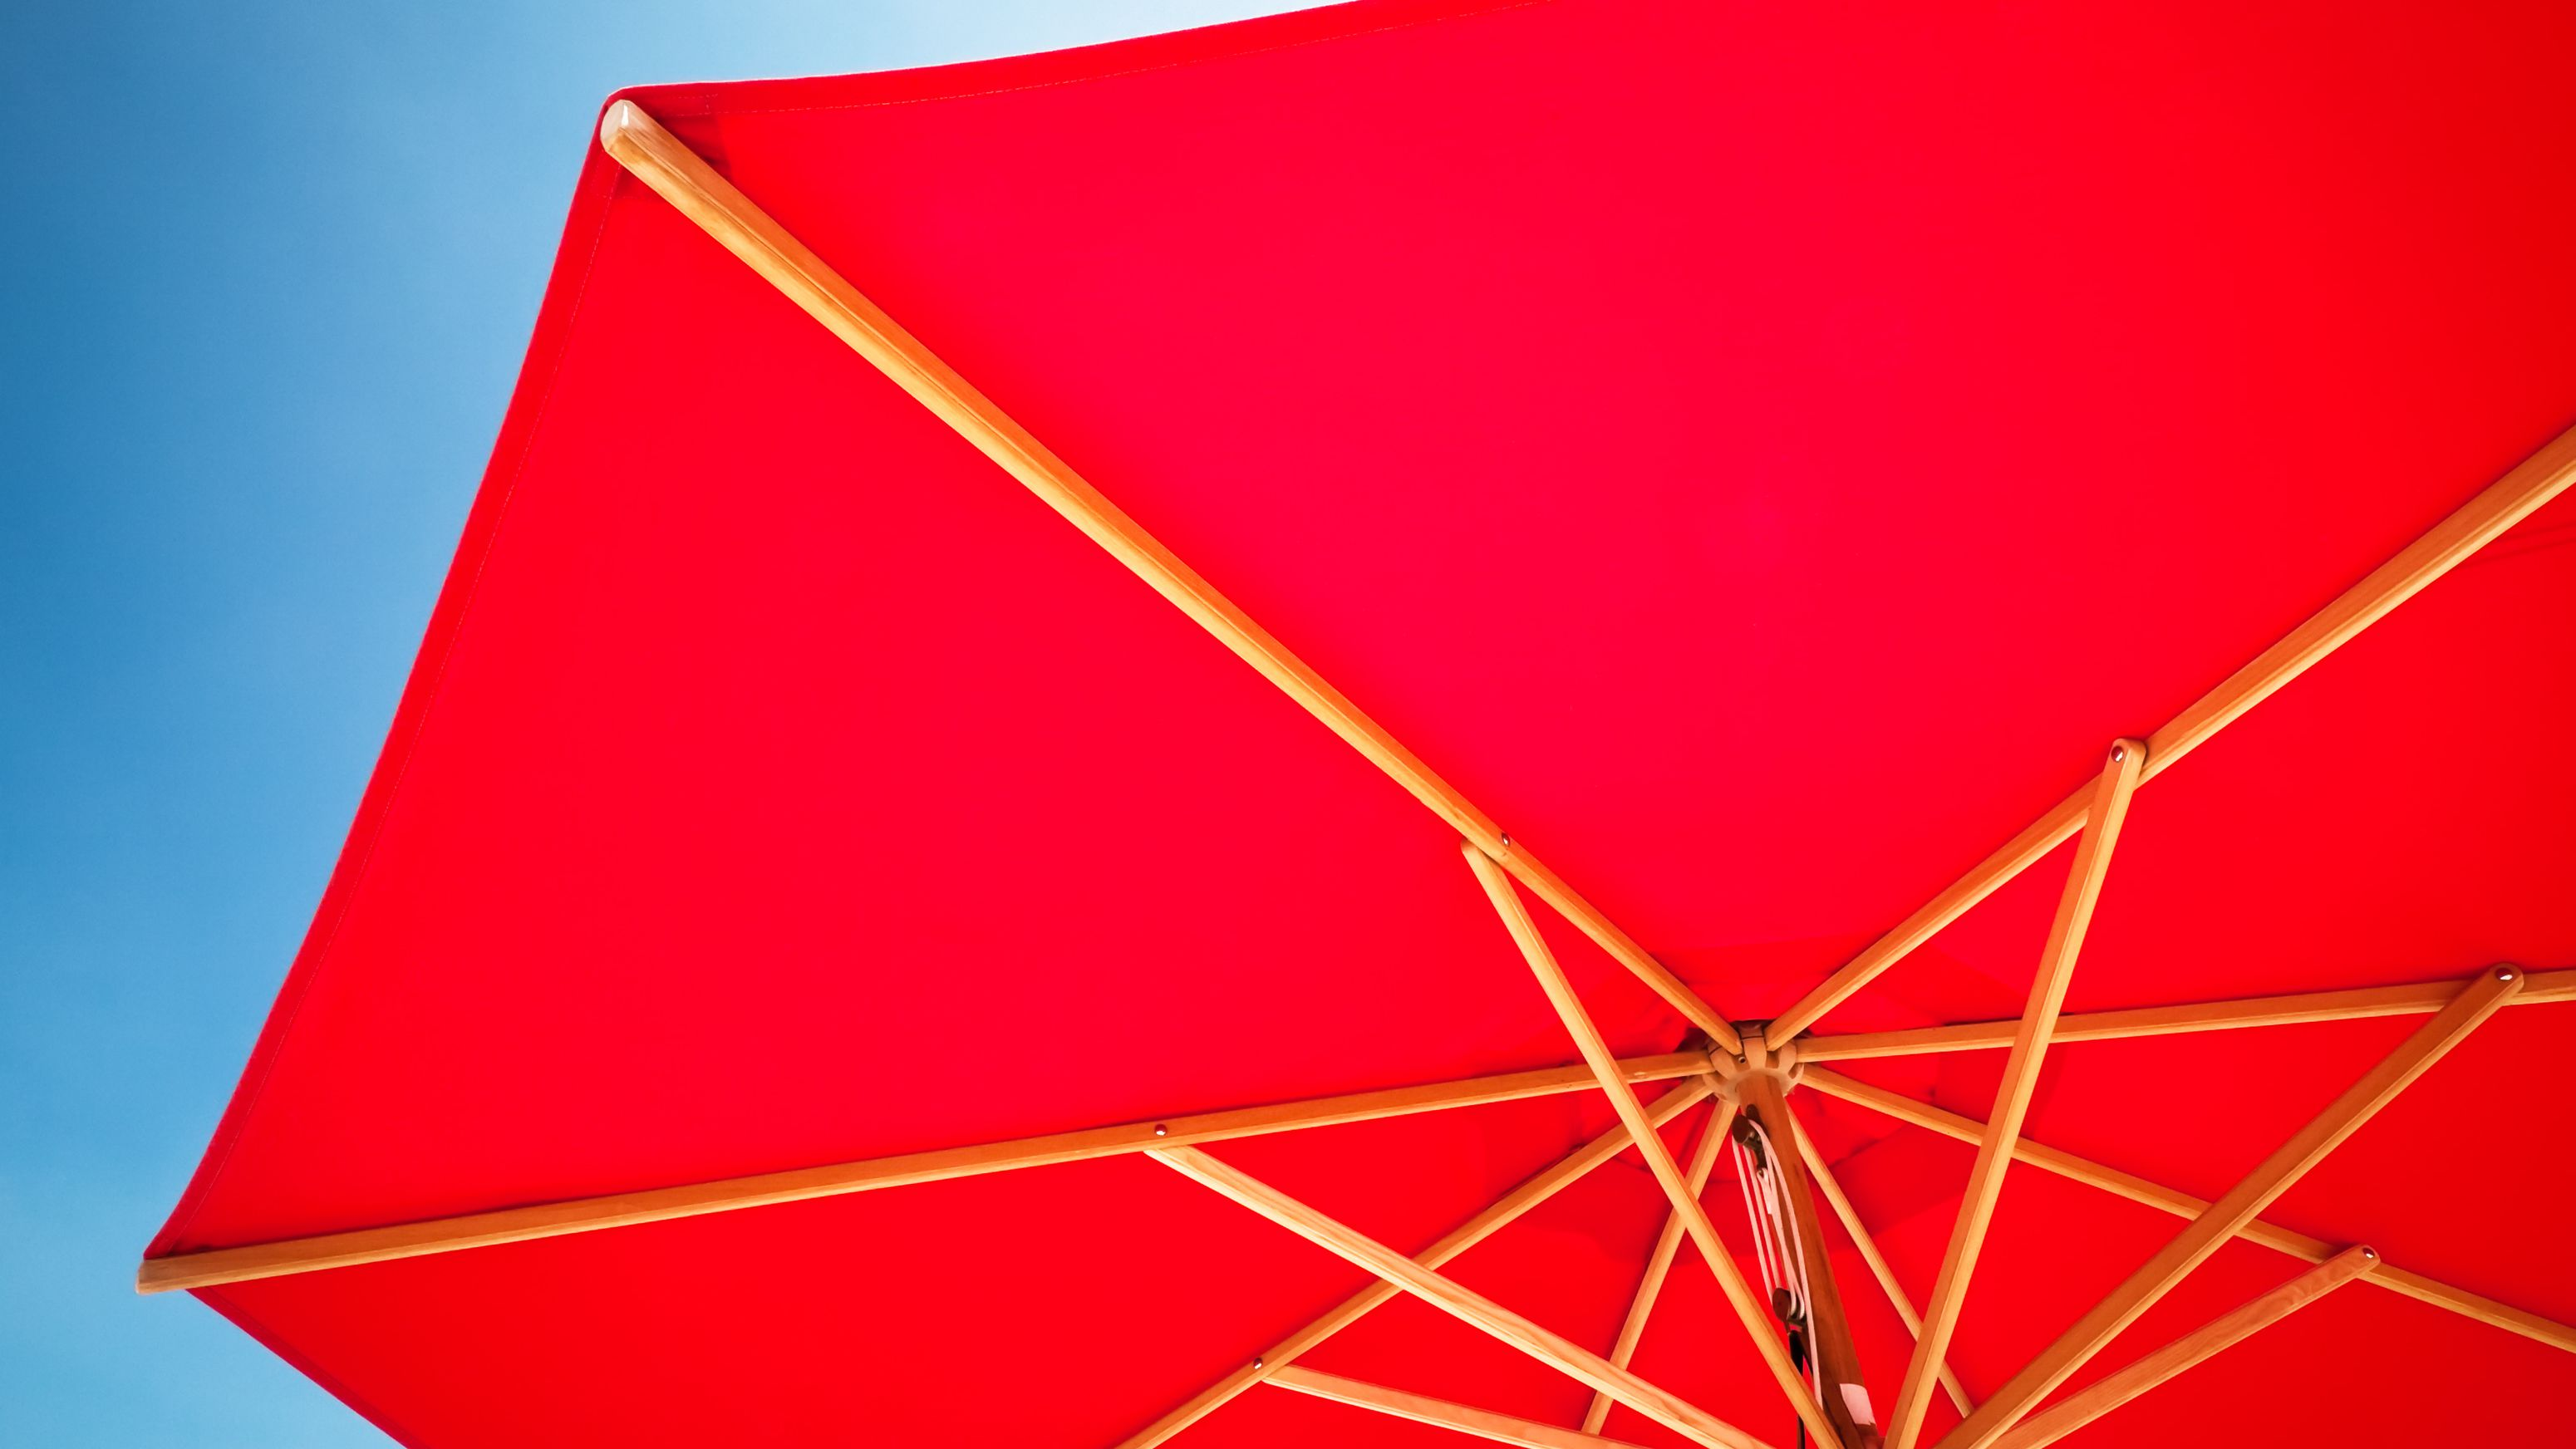 ffcf760e4aa0d The 8 Best Outdoor Patio Umbrellas of 2019